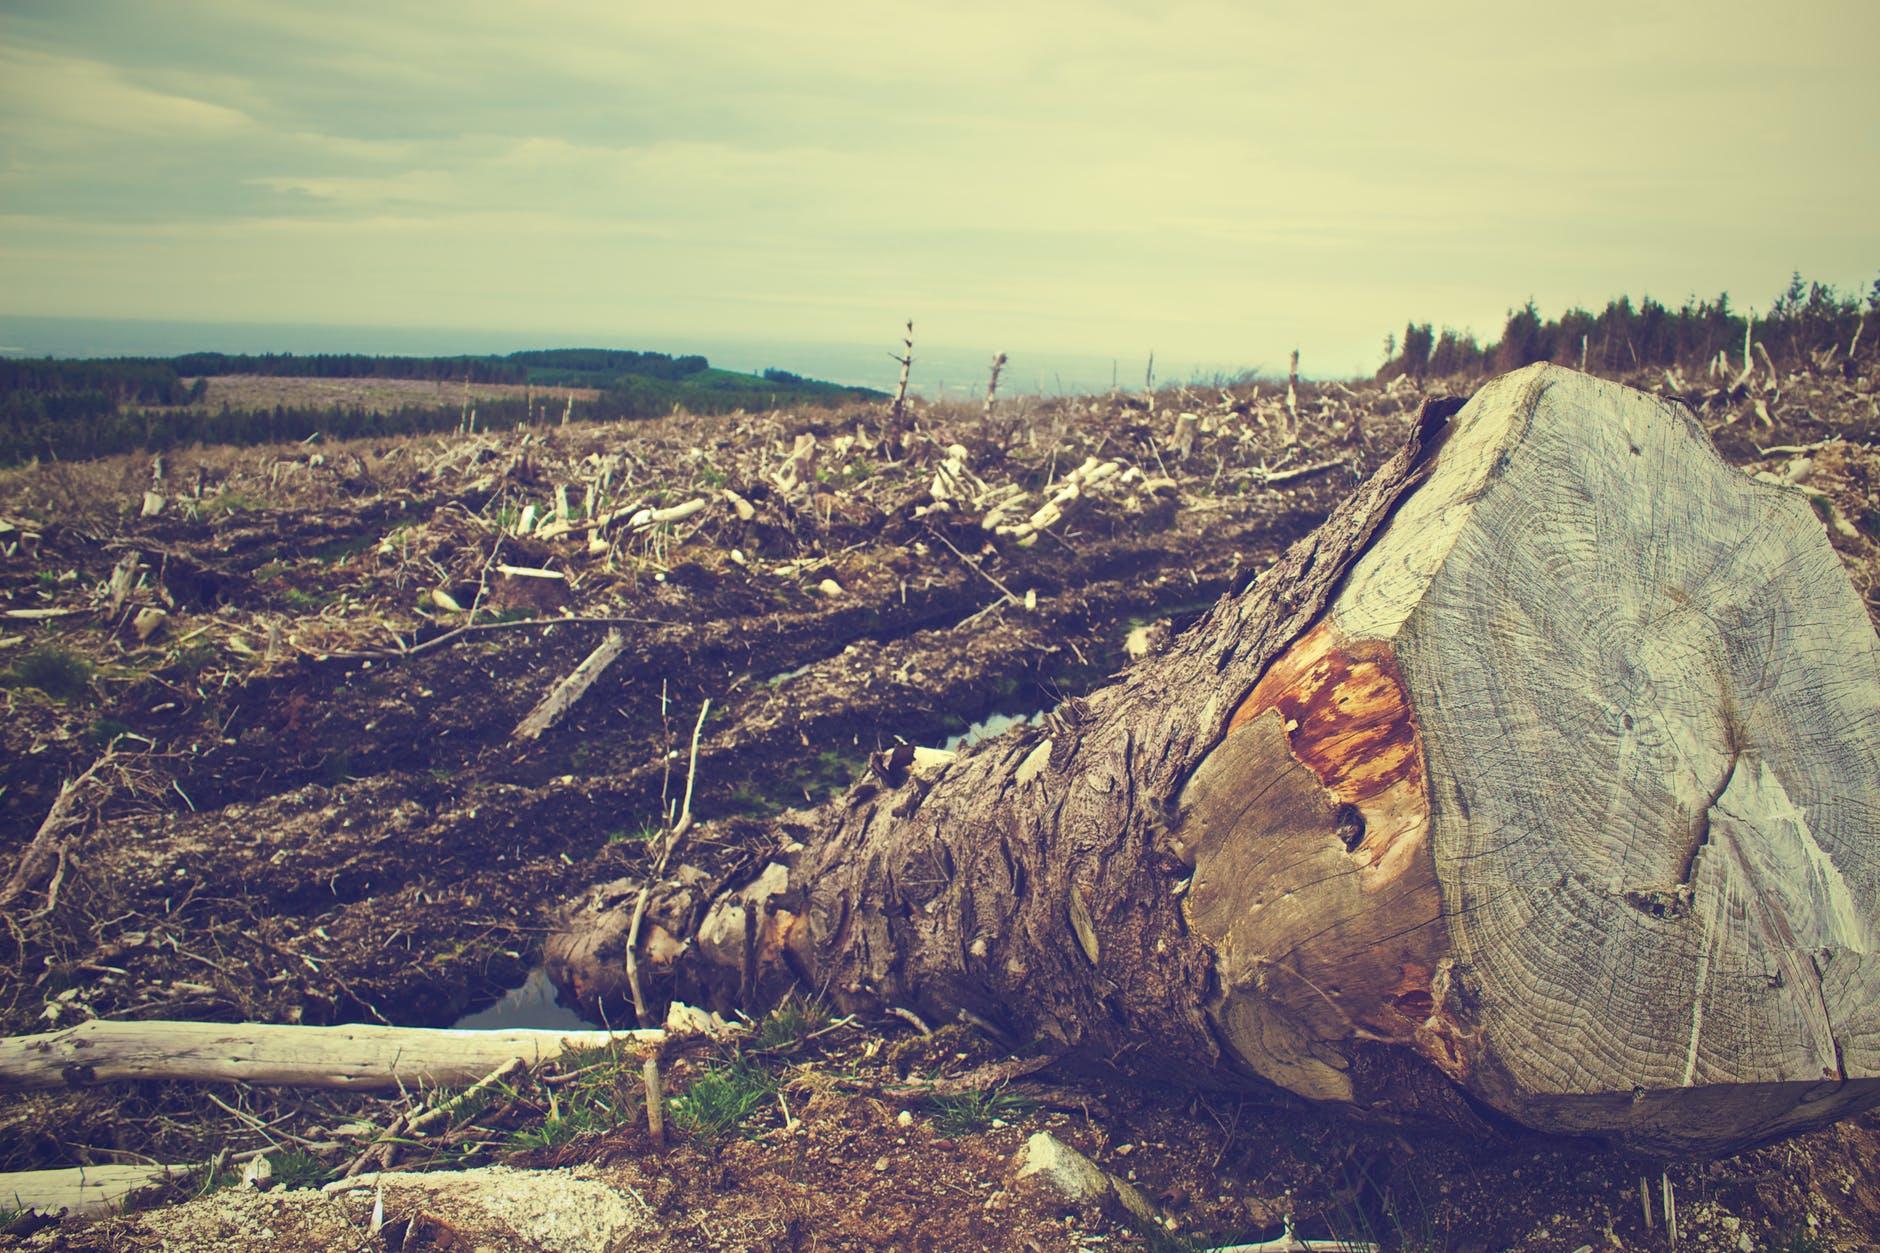 clearing desolation destruction fallen tree